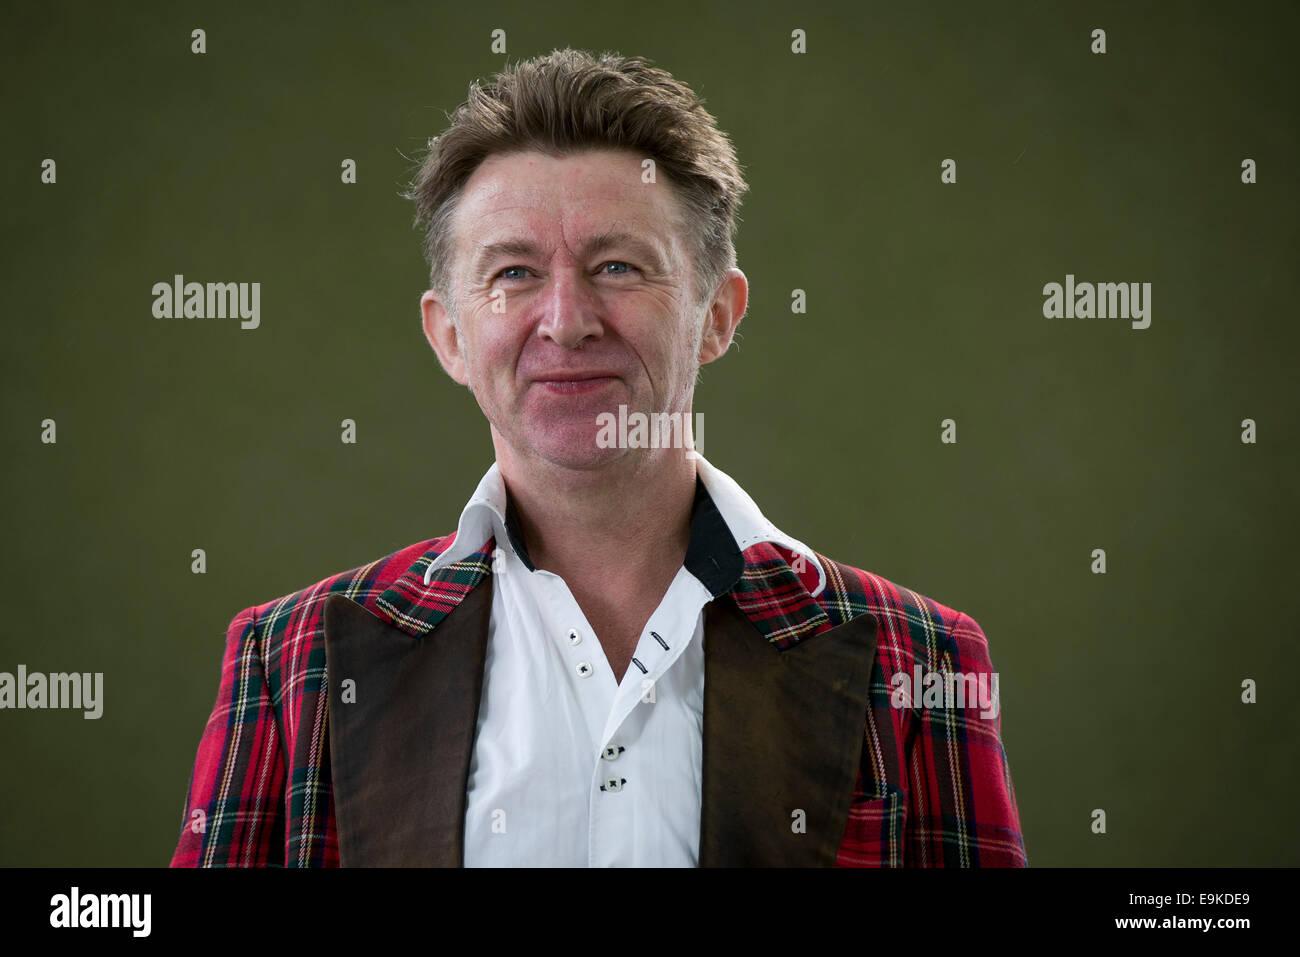 Award-winning Scottish poet, stand-up comedian Elvis McGonagall appears at the Edinburgh International Book Festival. - Stock Image